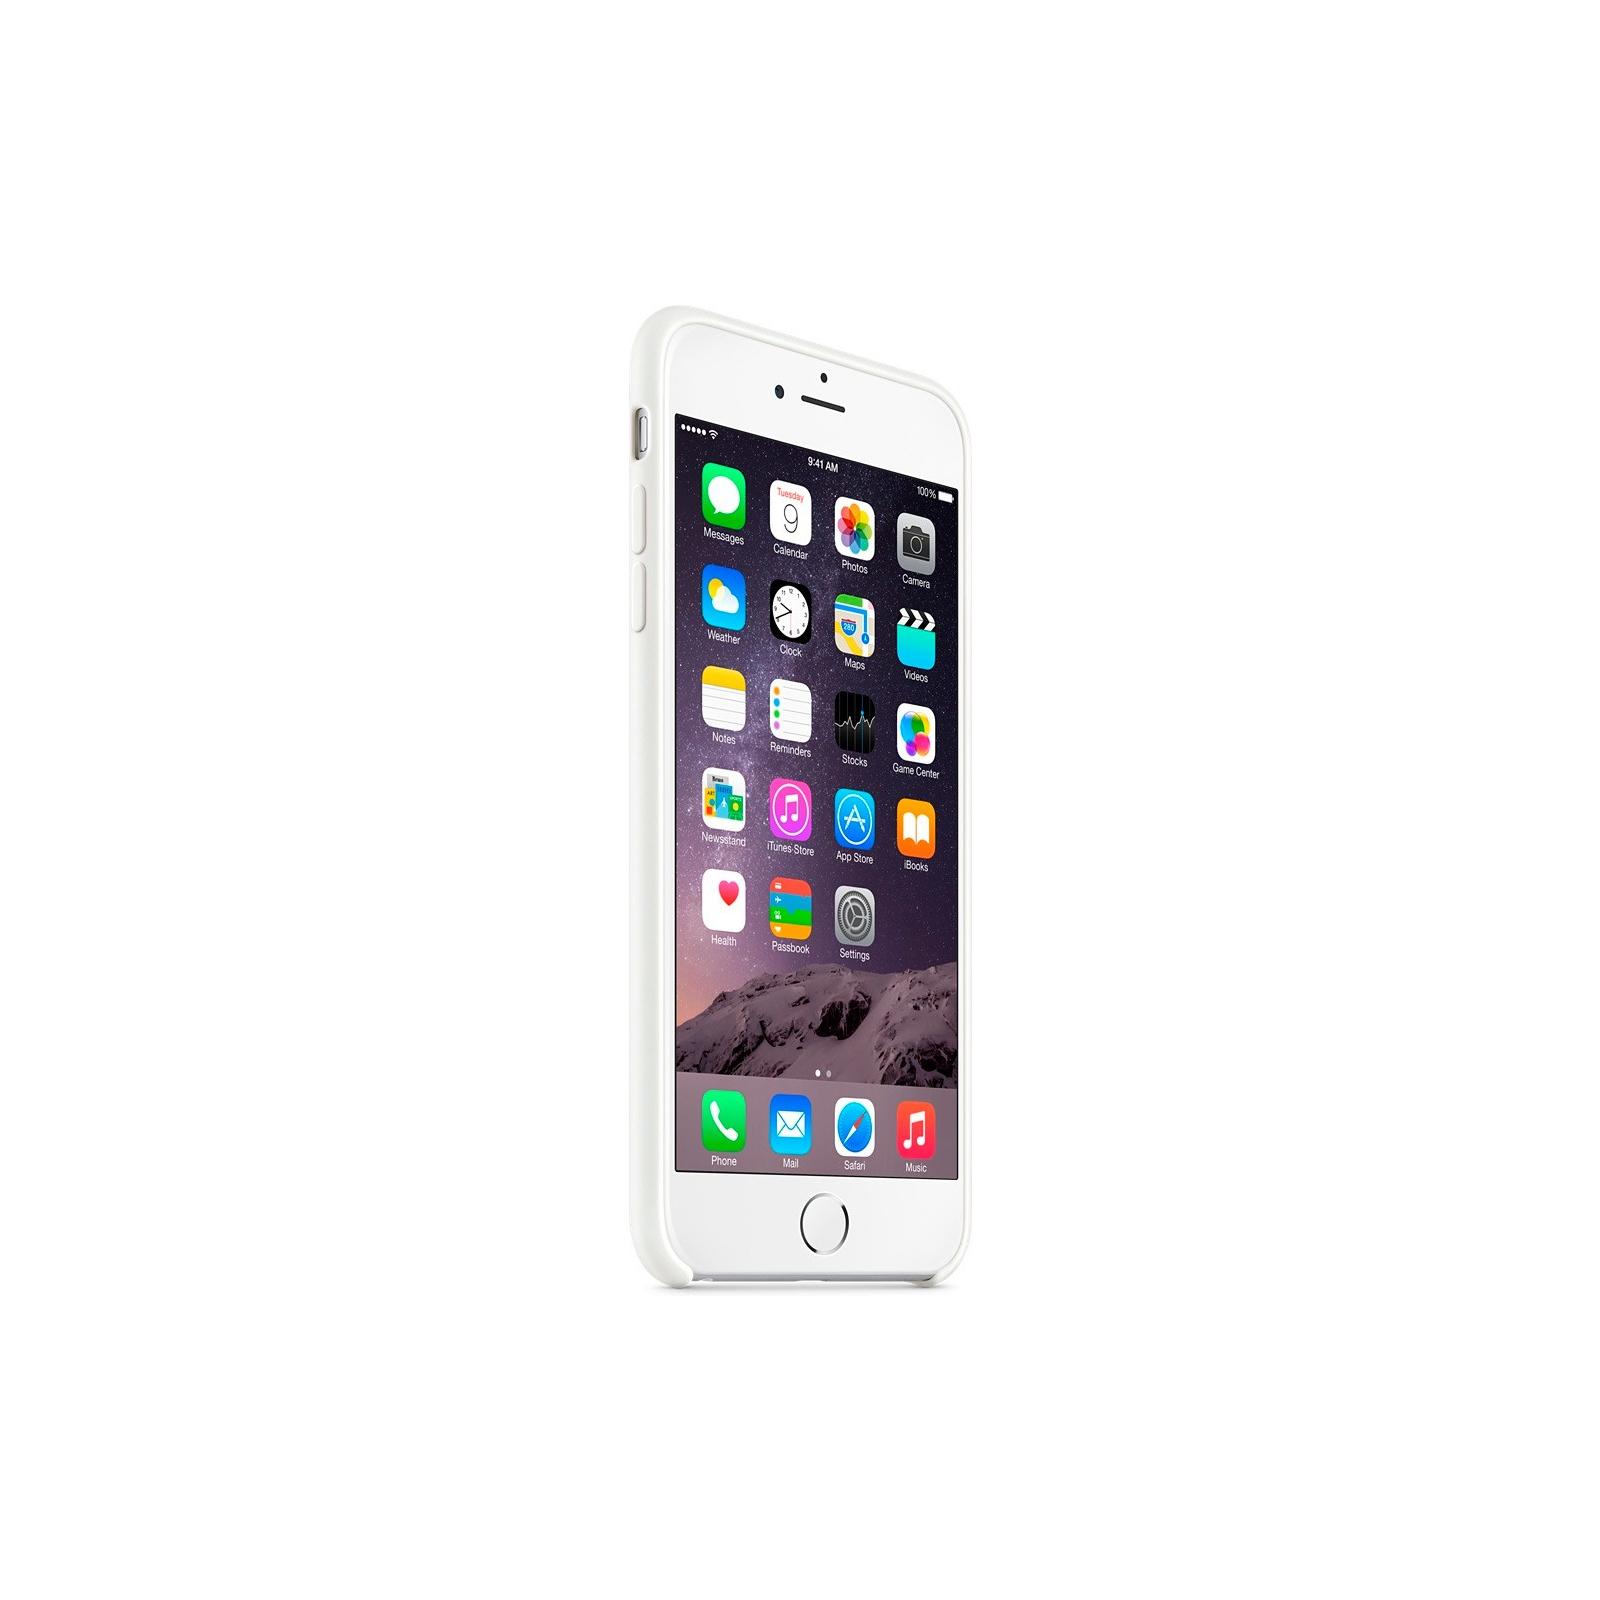 Чехол для моб. телефона Apple для iPhone 6 /white (MGRF2ZM/A) изображение 4